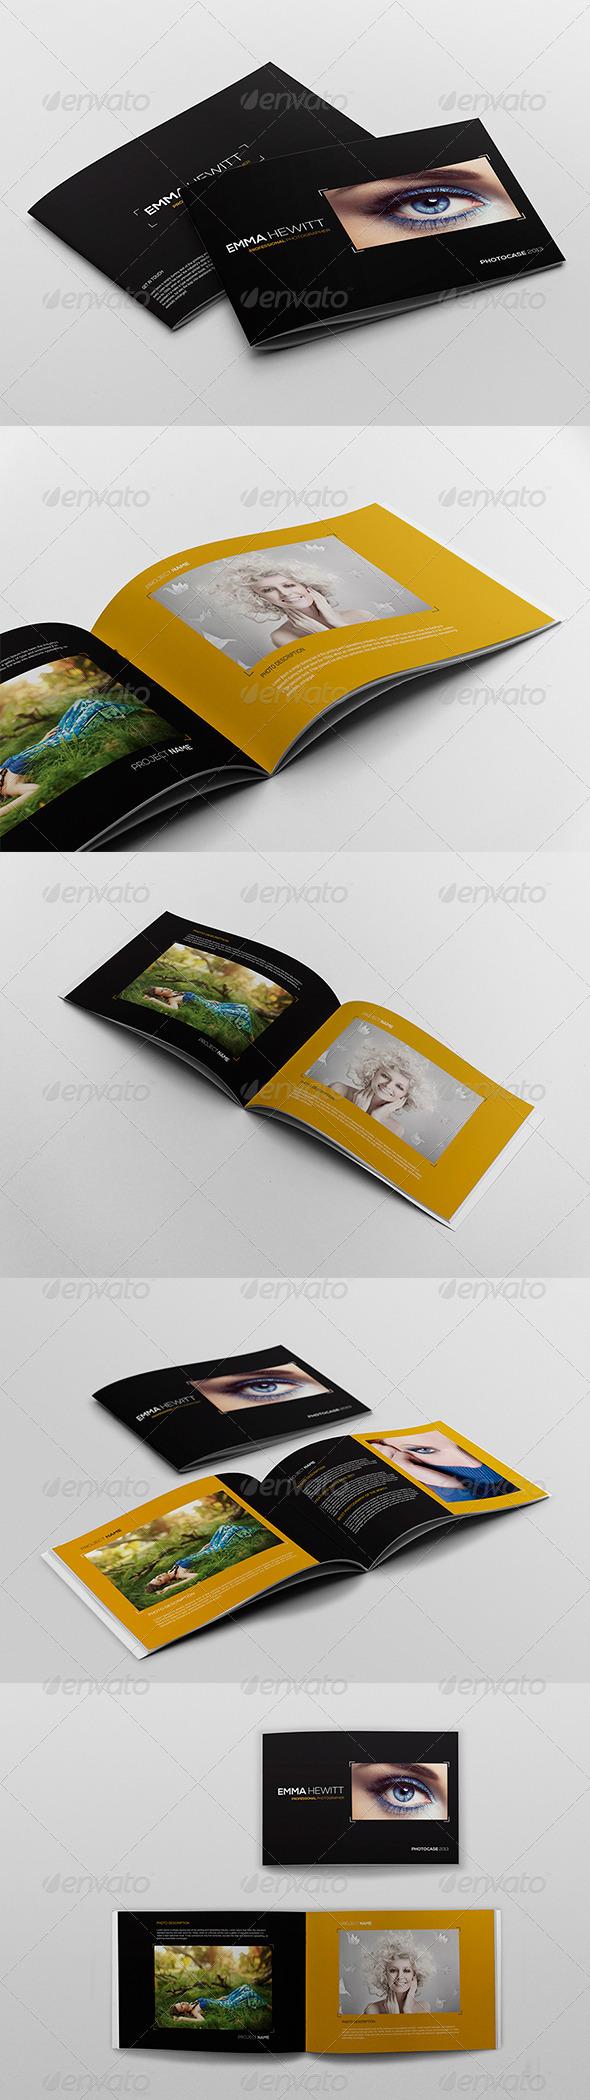 GraphicRiver Portfolio Brochure 001 6067578